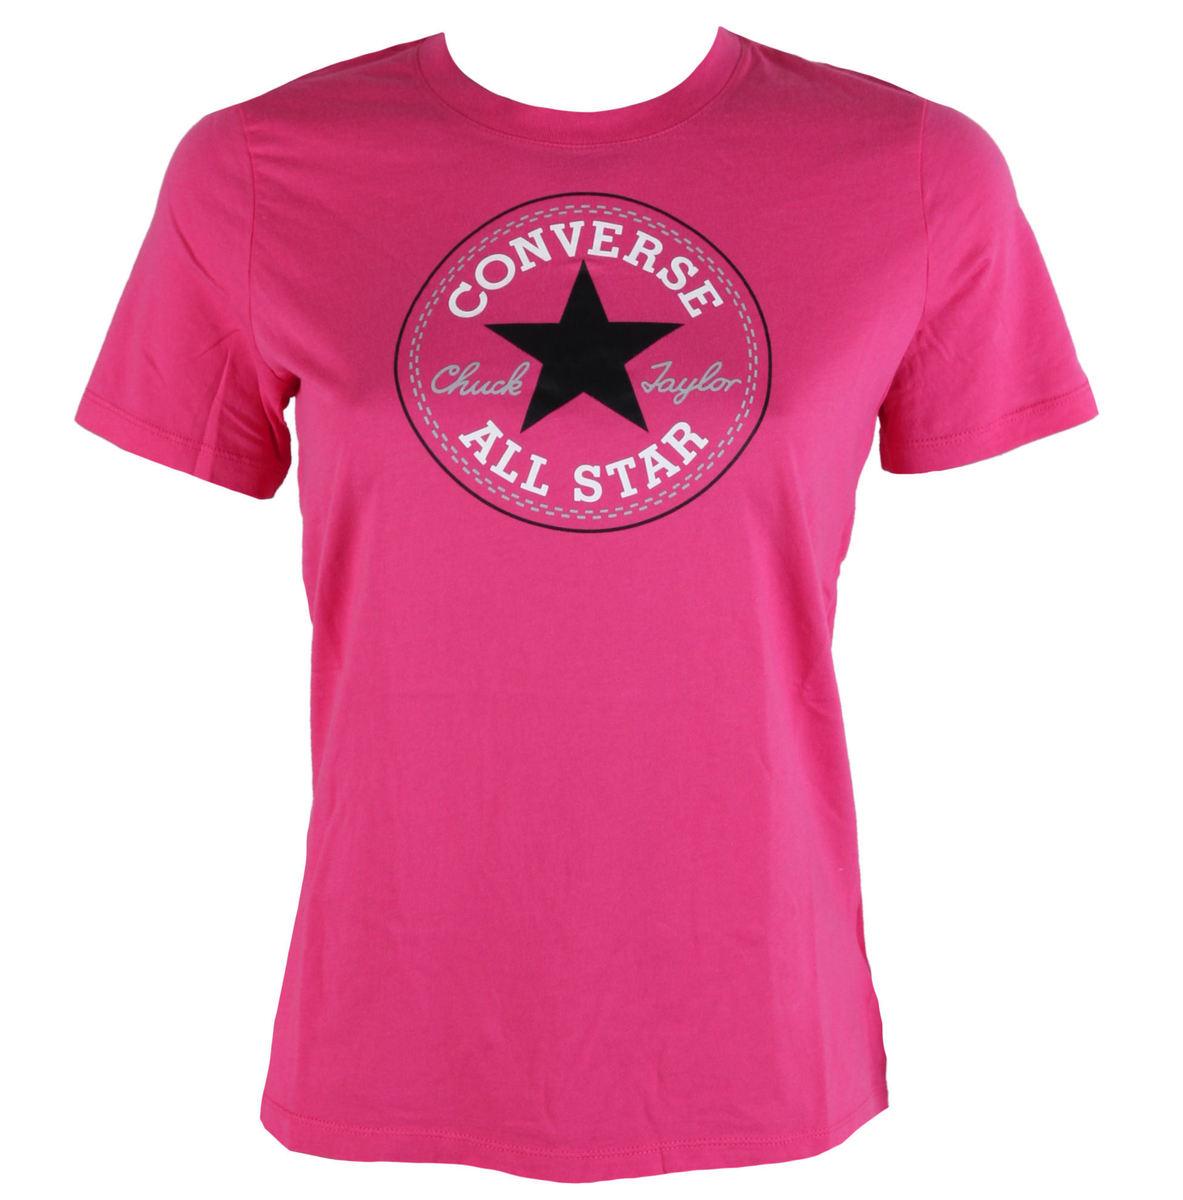 tričko dámské CONVERSE - Core Solid - 10001124-660